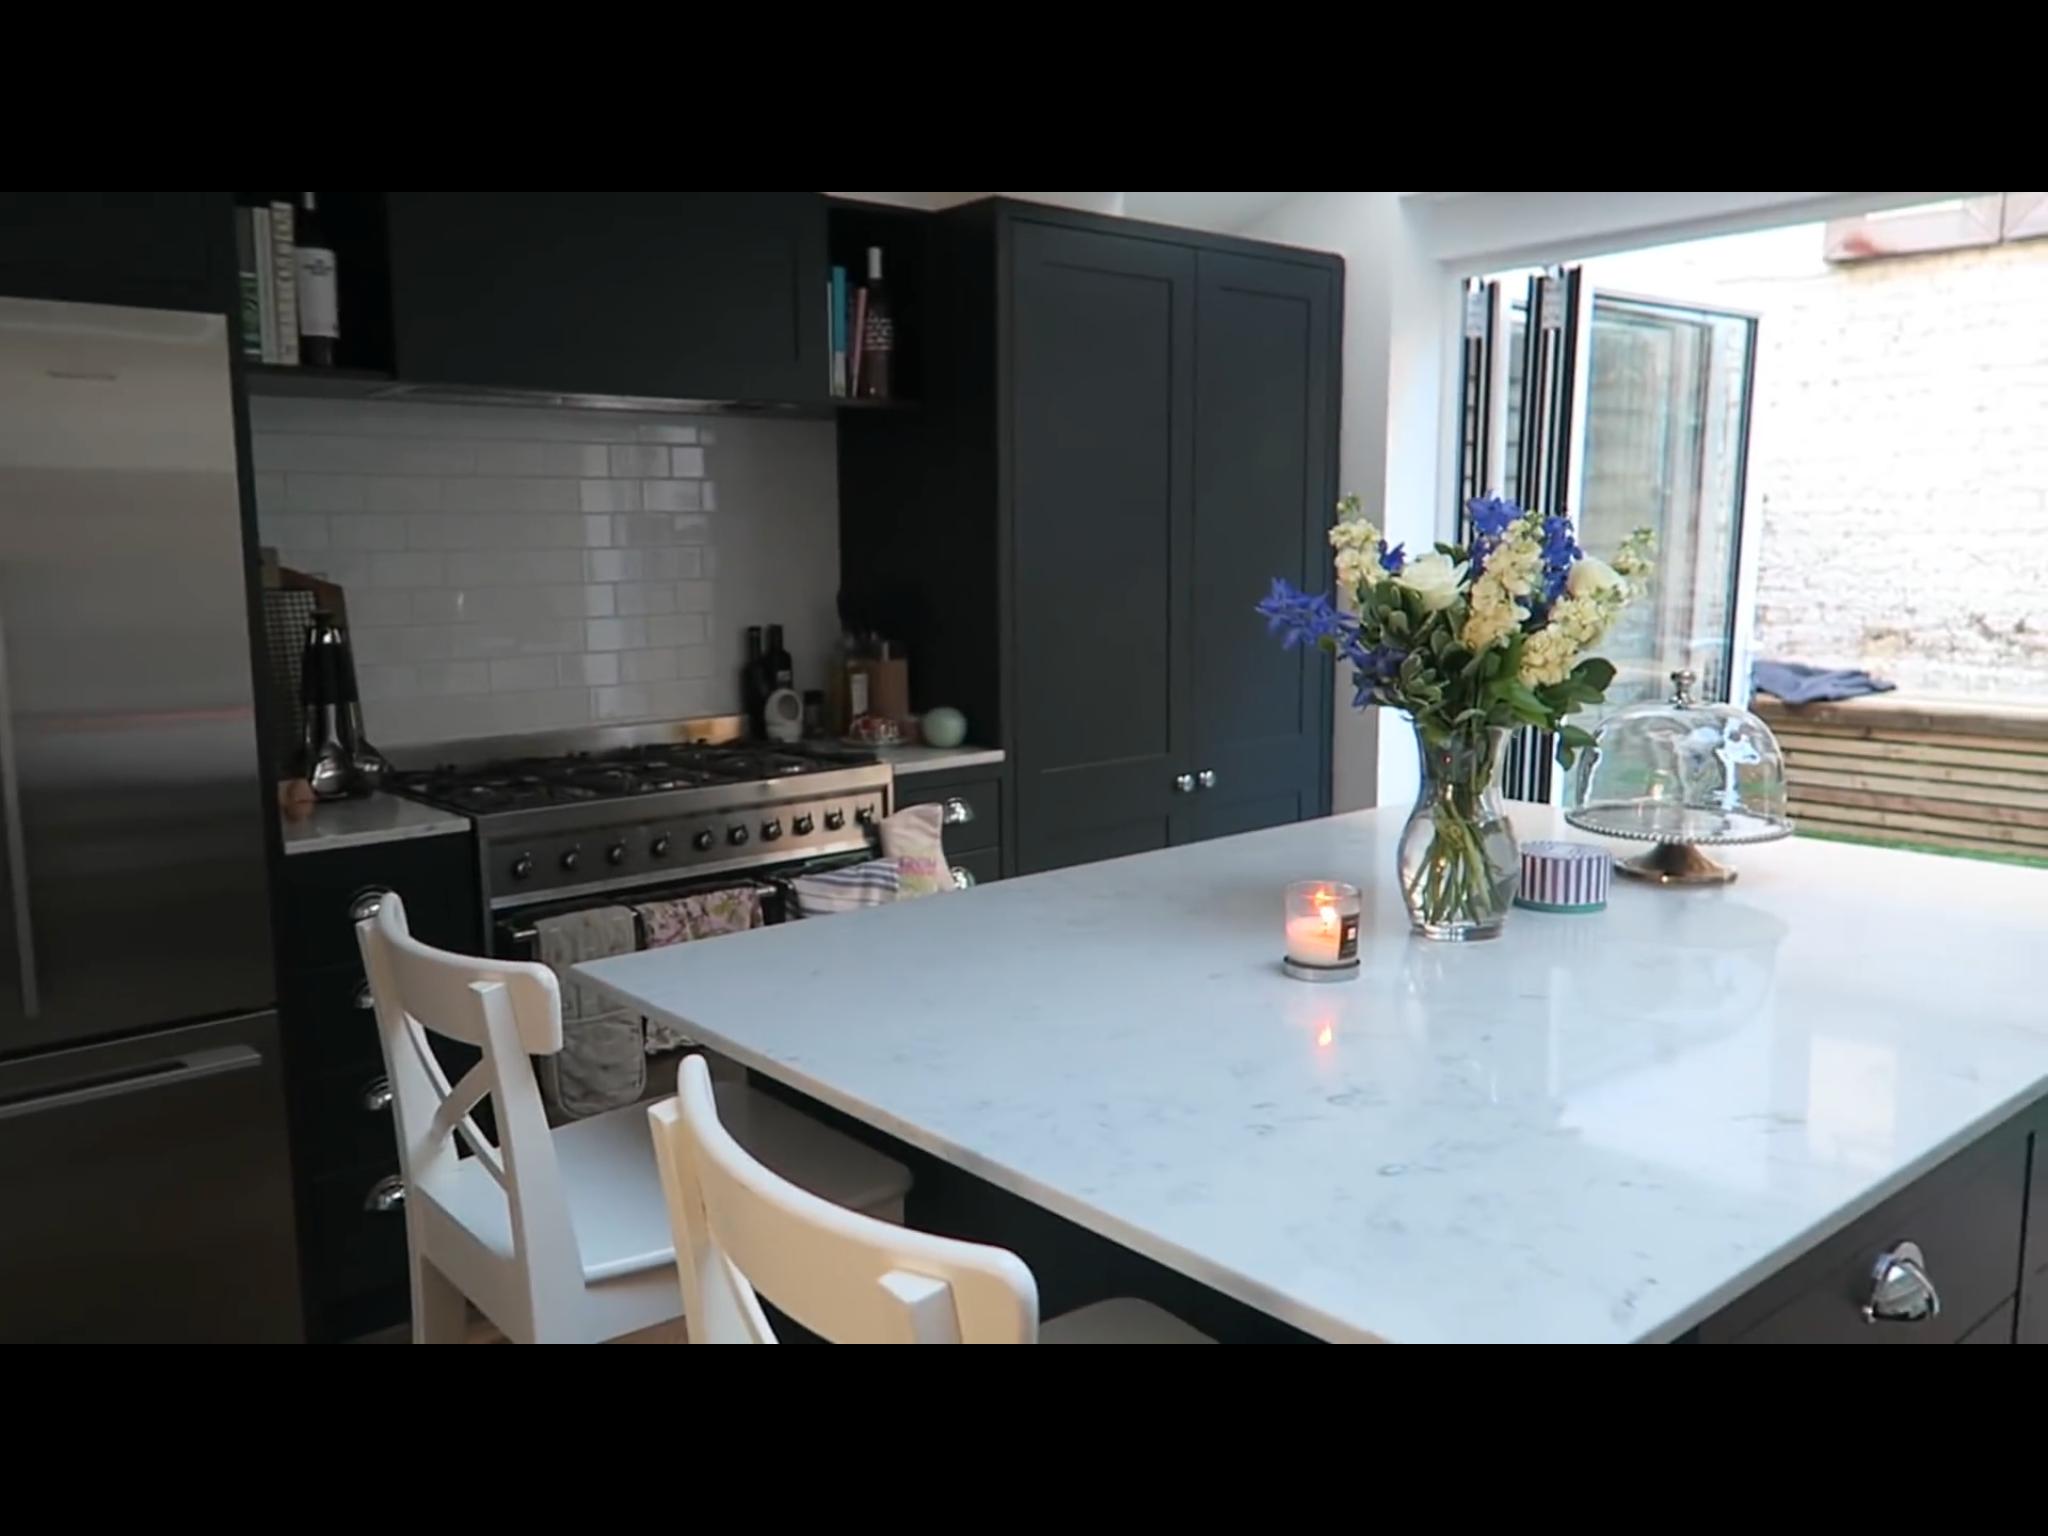 Tanya Burr Jim Chapman S New Kitchen Love The Quartz Top And